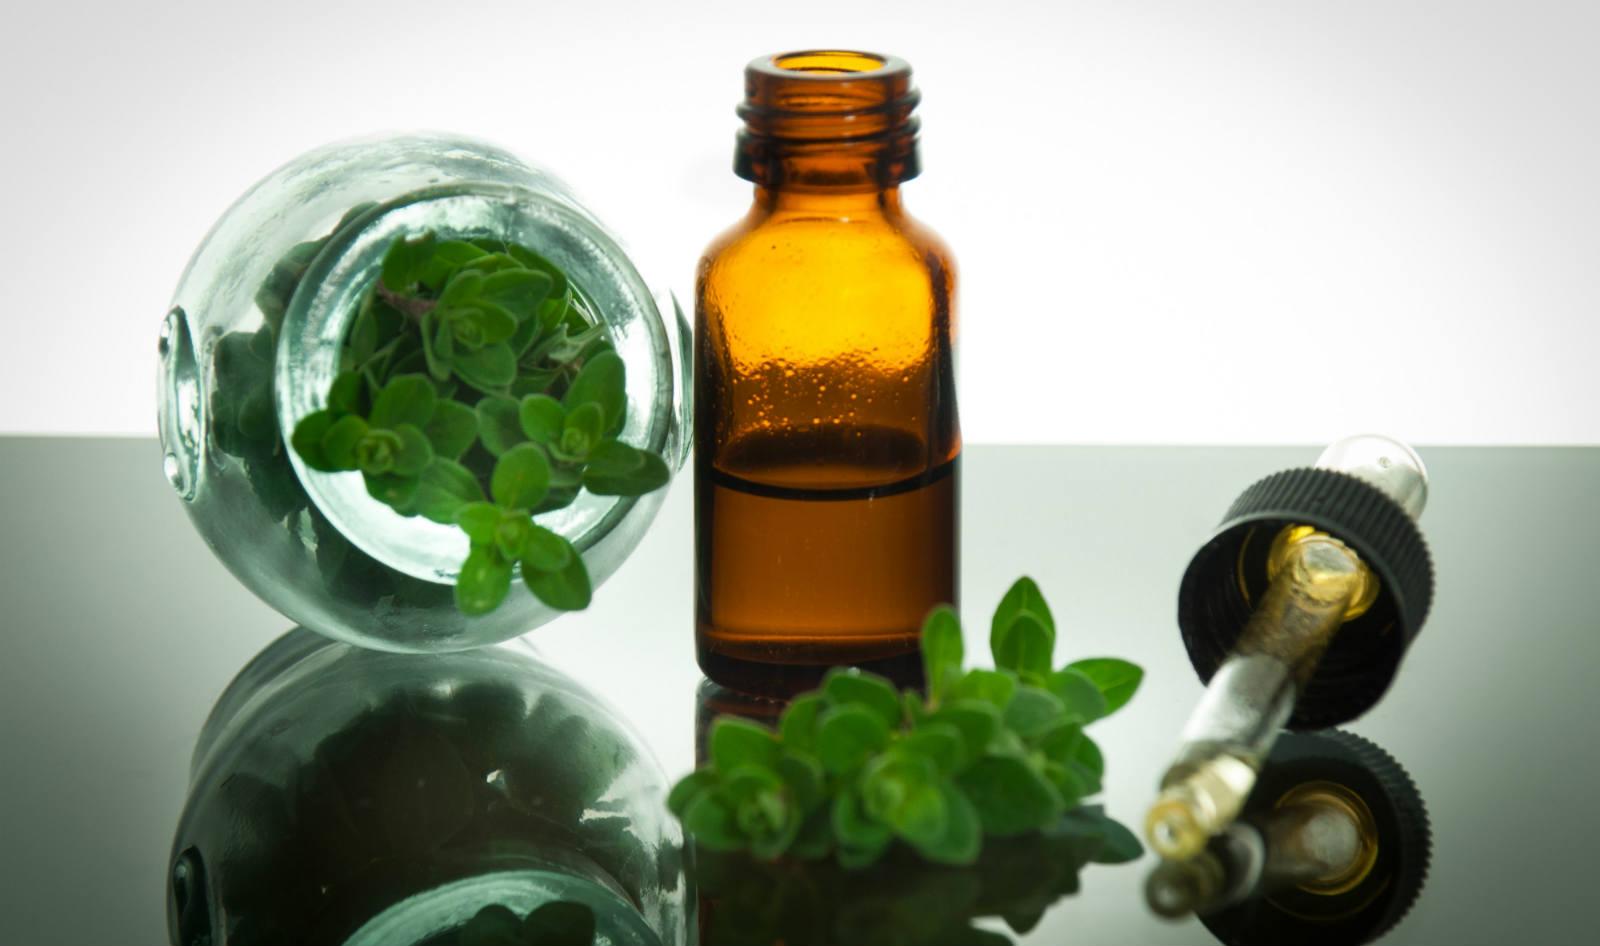 home remedy for diarrhea - Oregano Oil